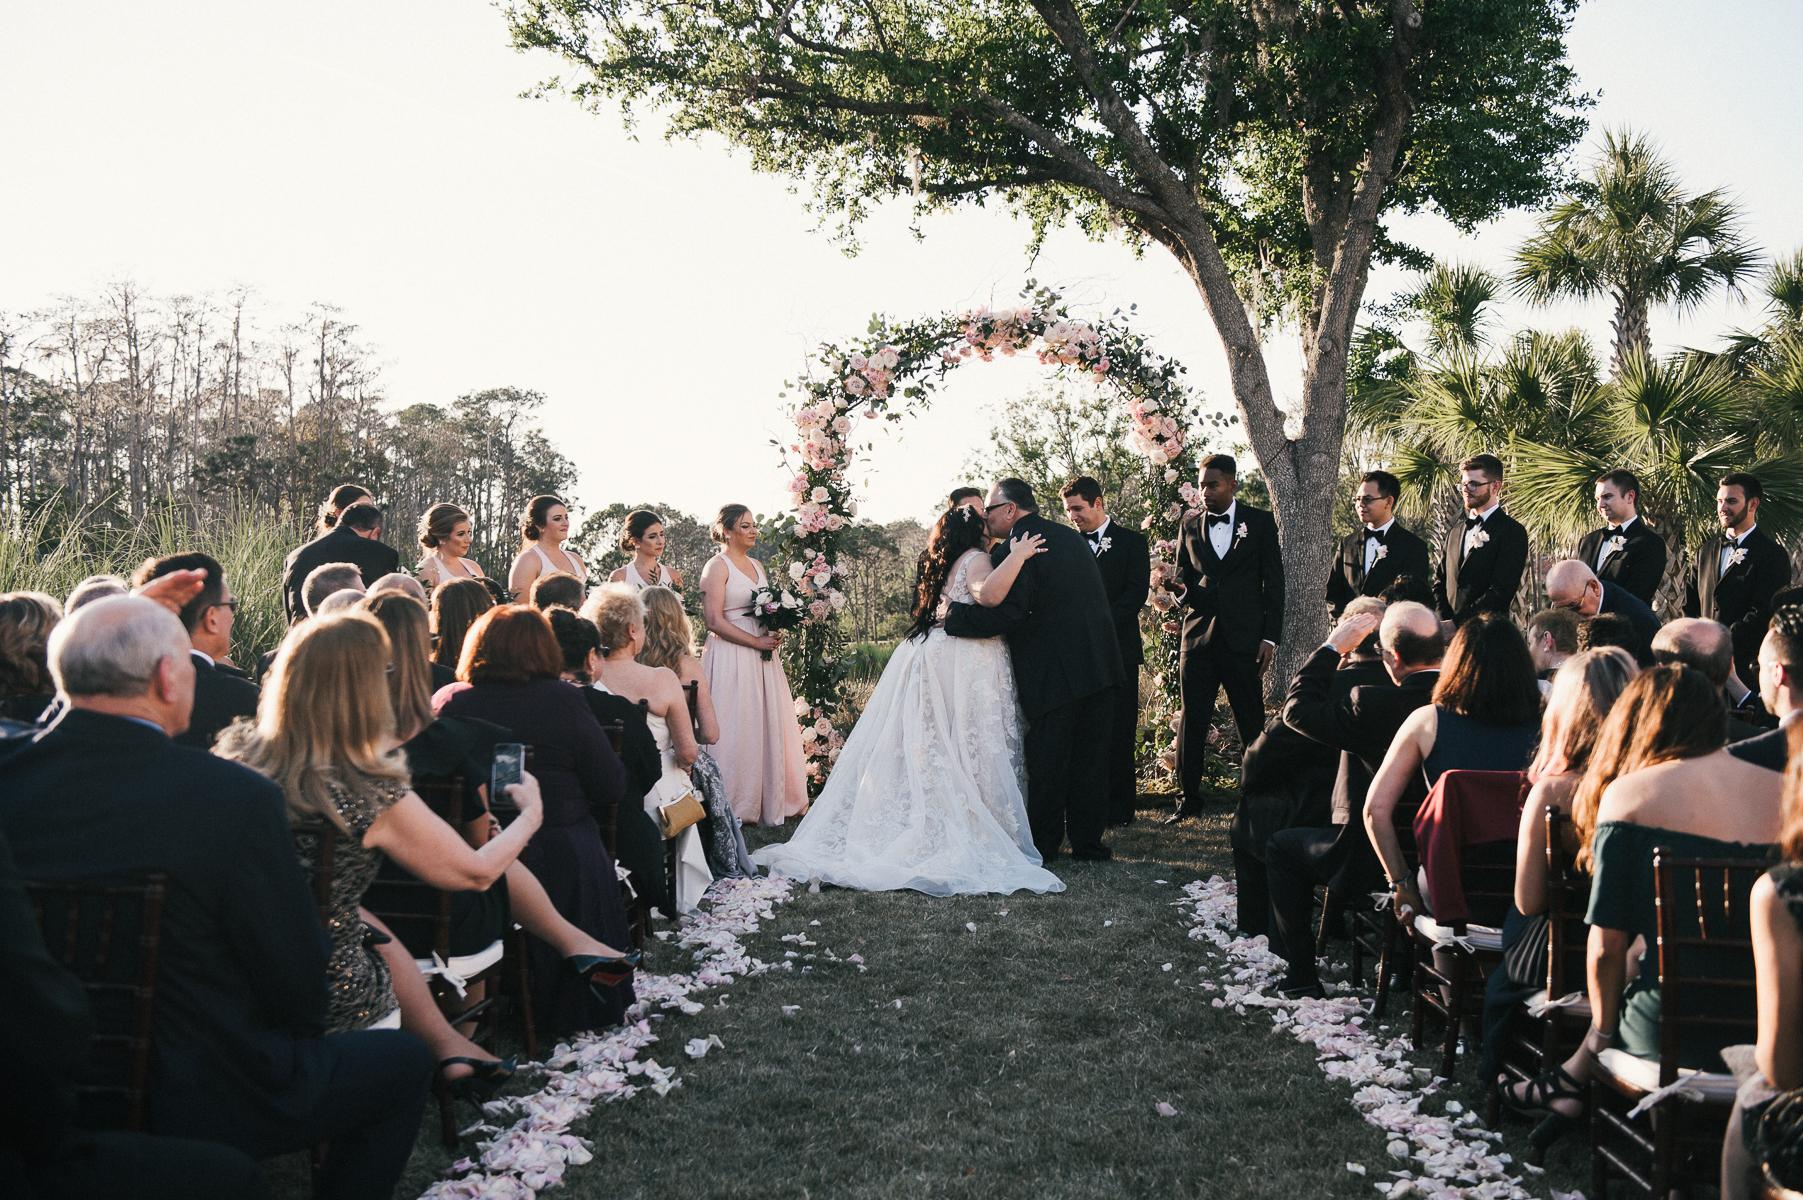 Wedding Photographer: Still 55 | Wedding Designer: Tres Chic Whitney | Wedding Location: Four Seasons Resort Orlando at Walt Disney